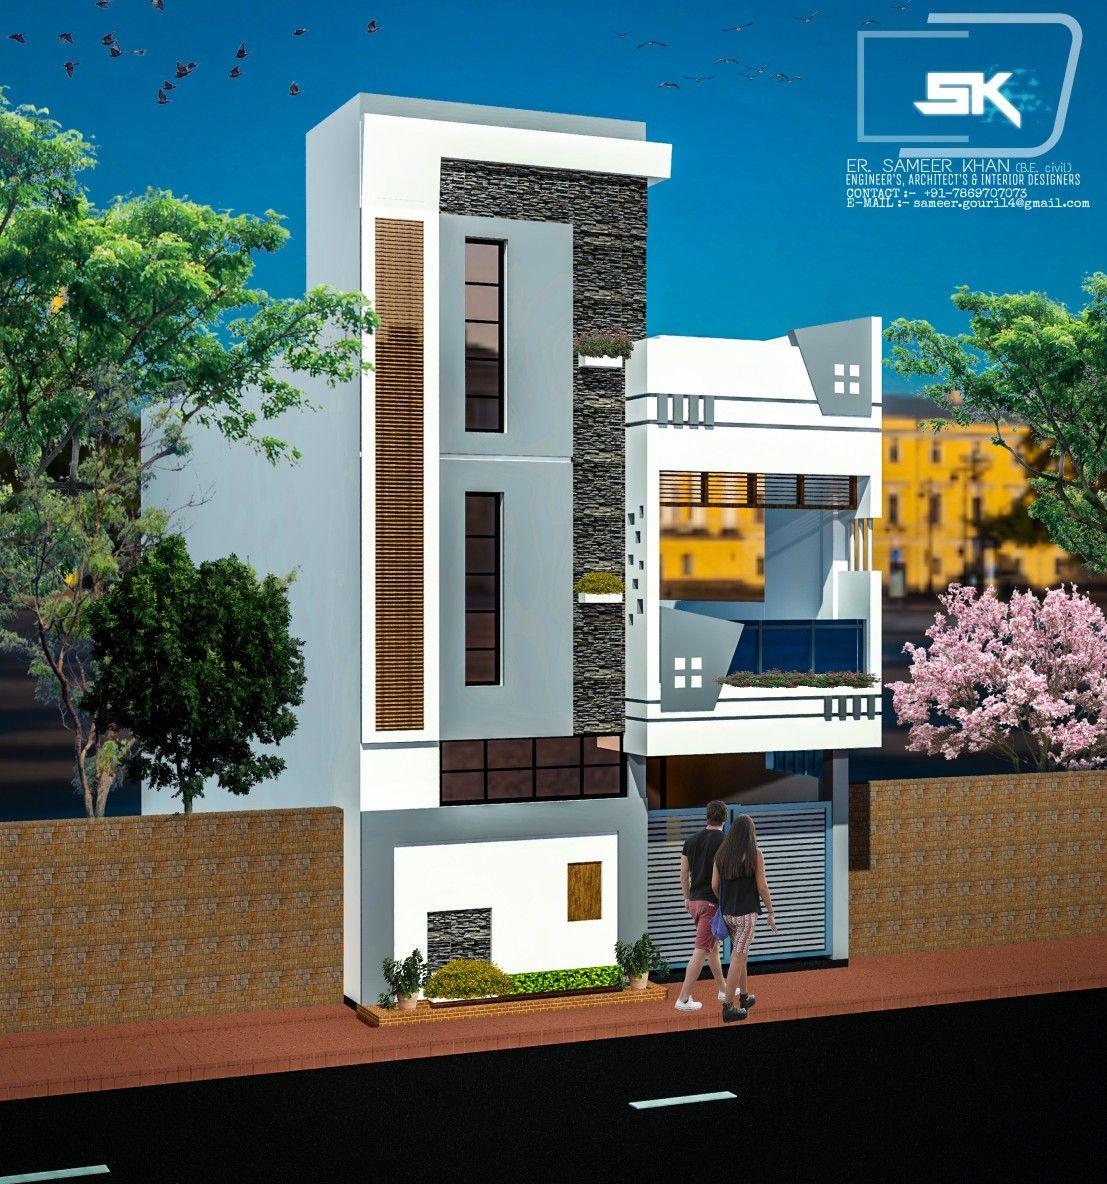 Introducing modern house elevation design in  front  by er sameer khan also best single story independent rh pinterest